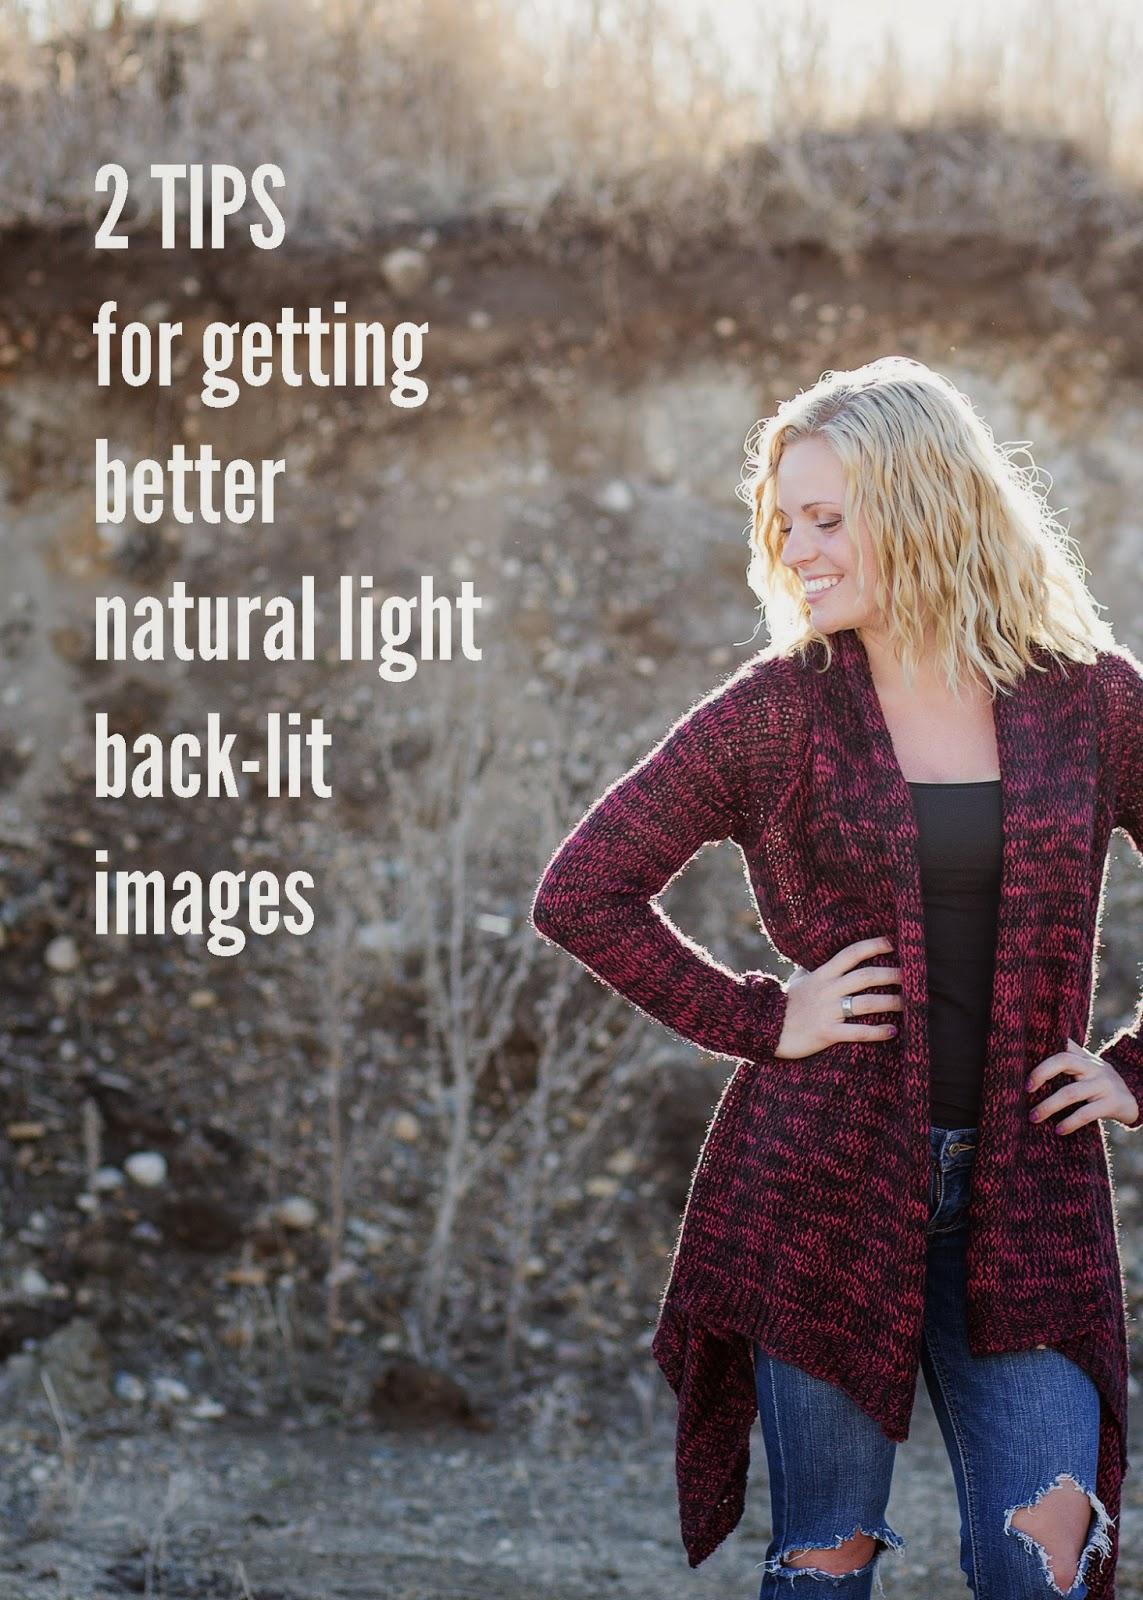 2 Tips for getting better natural light backlit images   Detroit Lakes area Portrait Photographer